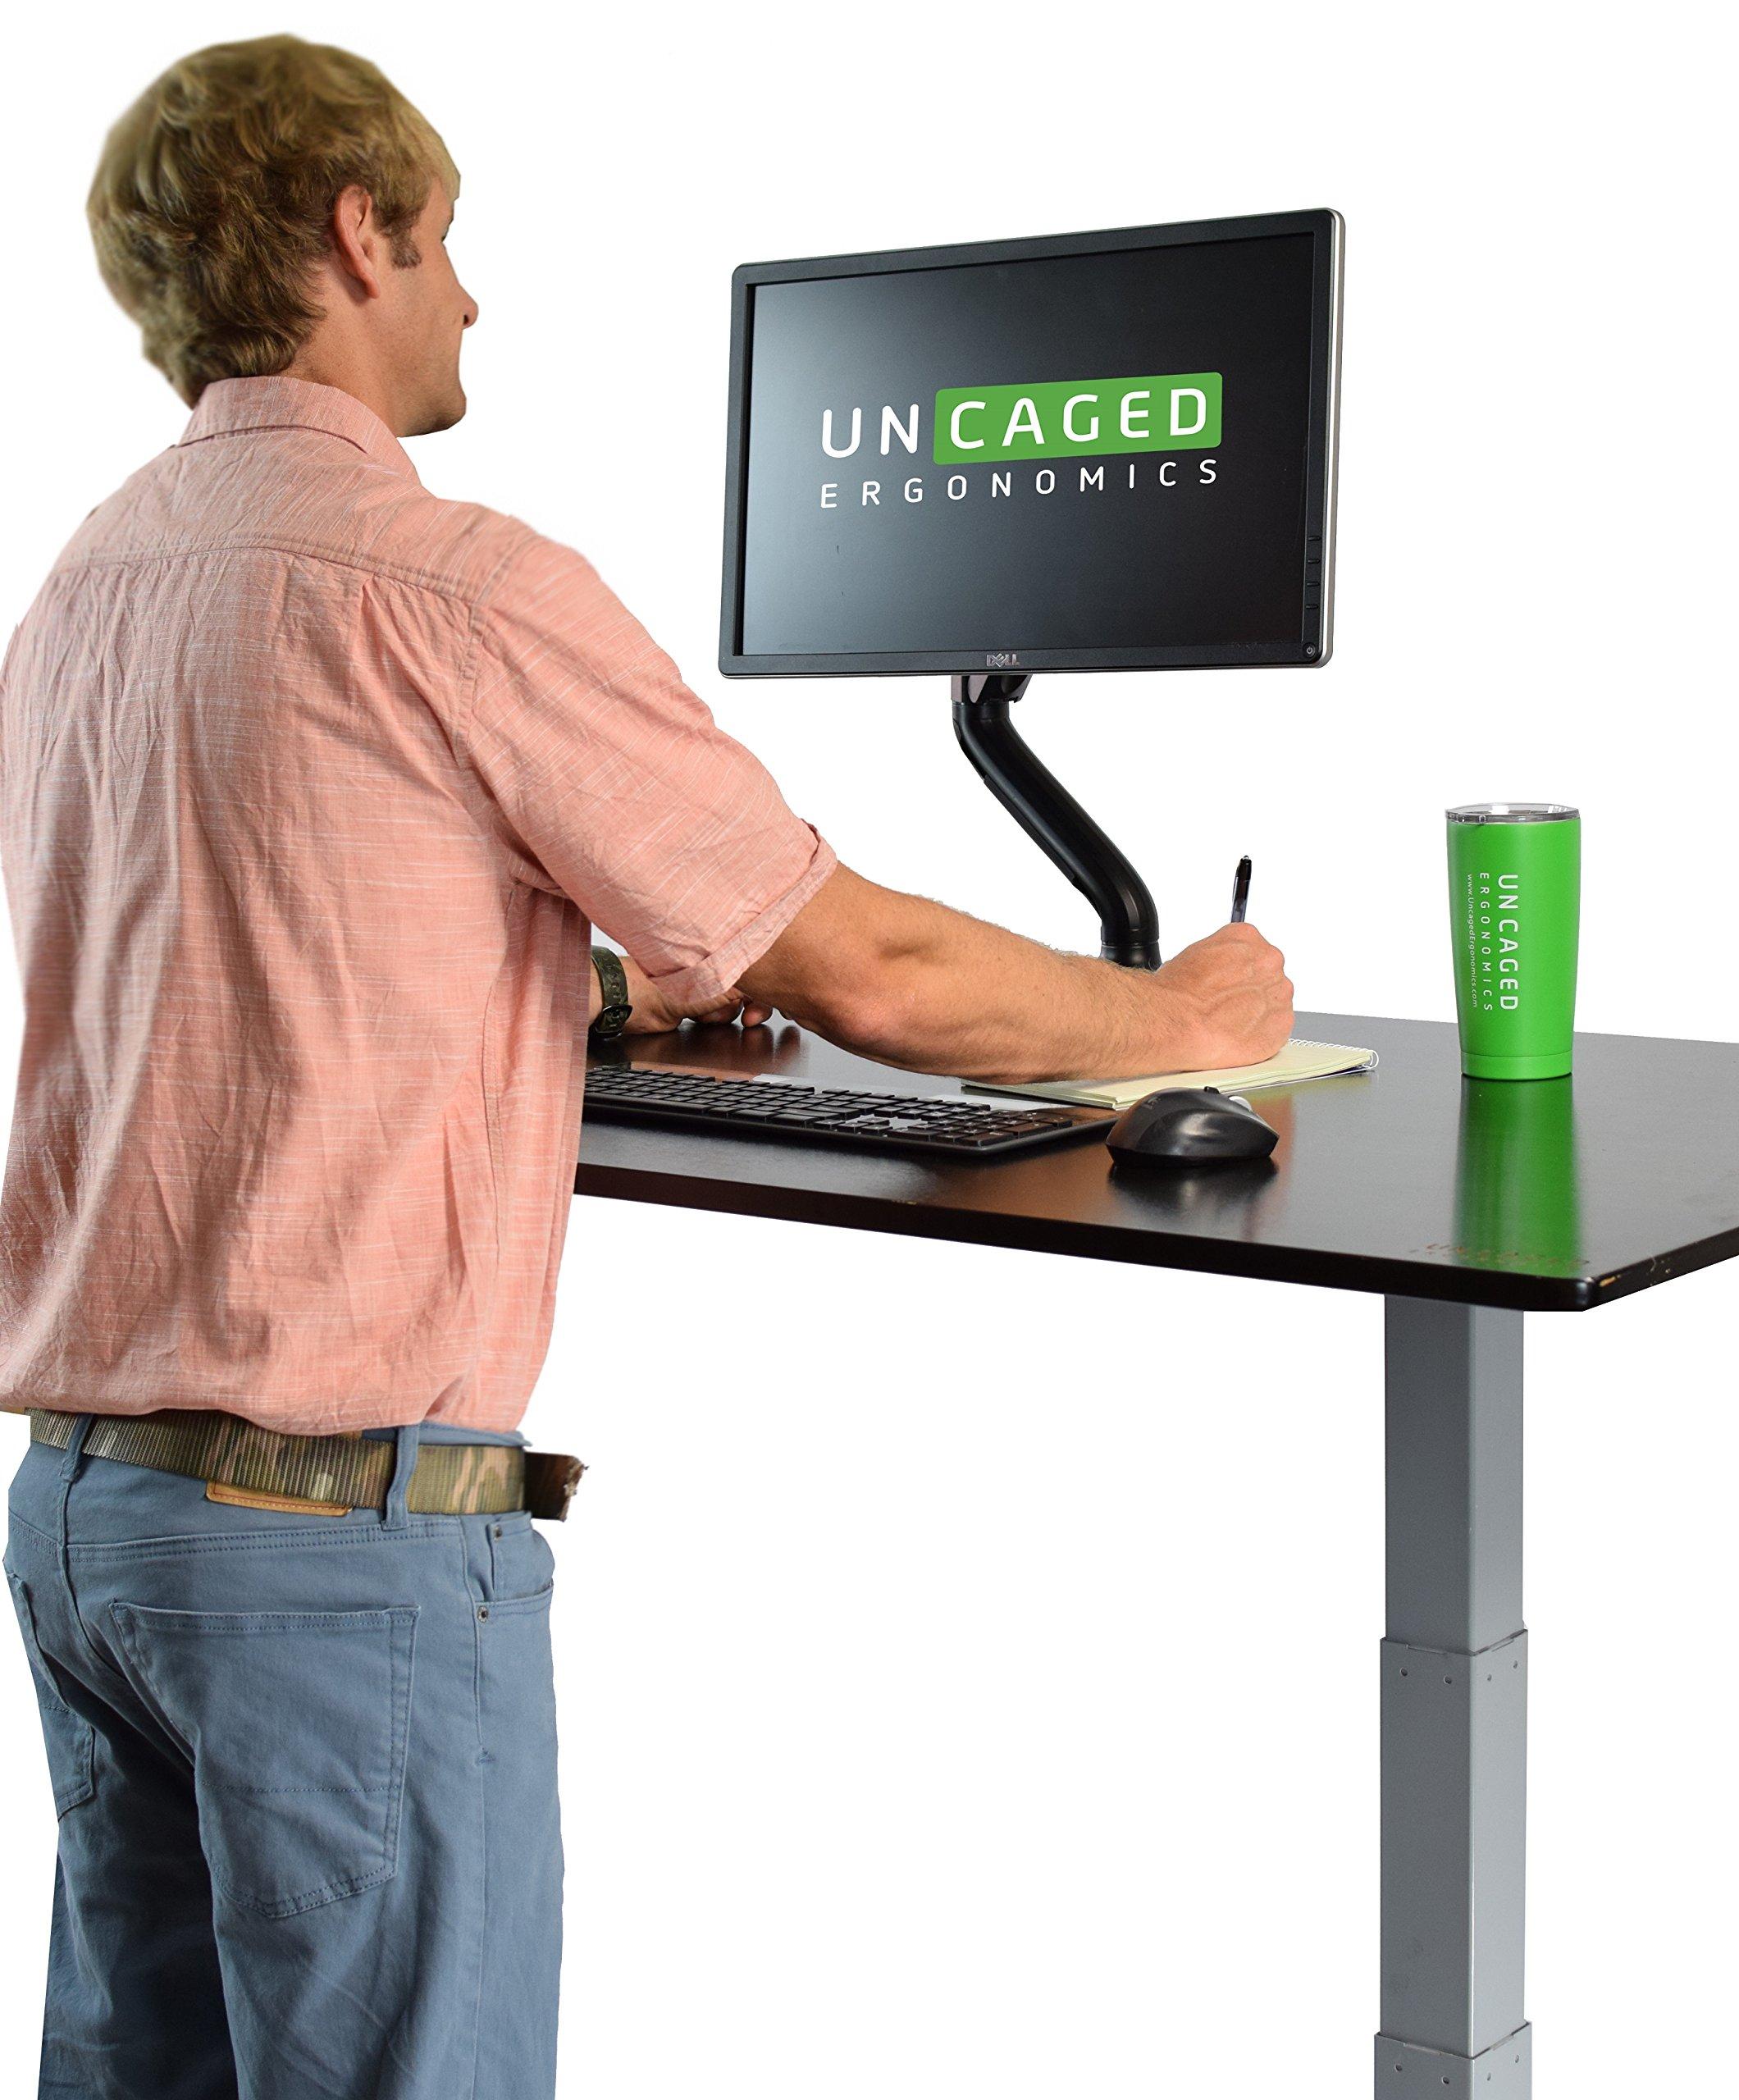 Swivel LCD Monitor Arm w/Unversal VESA Mount. Adjustable Height, Ergonomic, Single Desktop Computer Mount + Easy Gas Spring Adjustment + 2 USB Ports